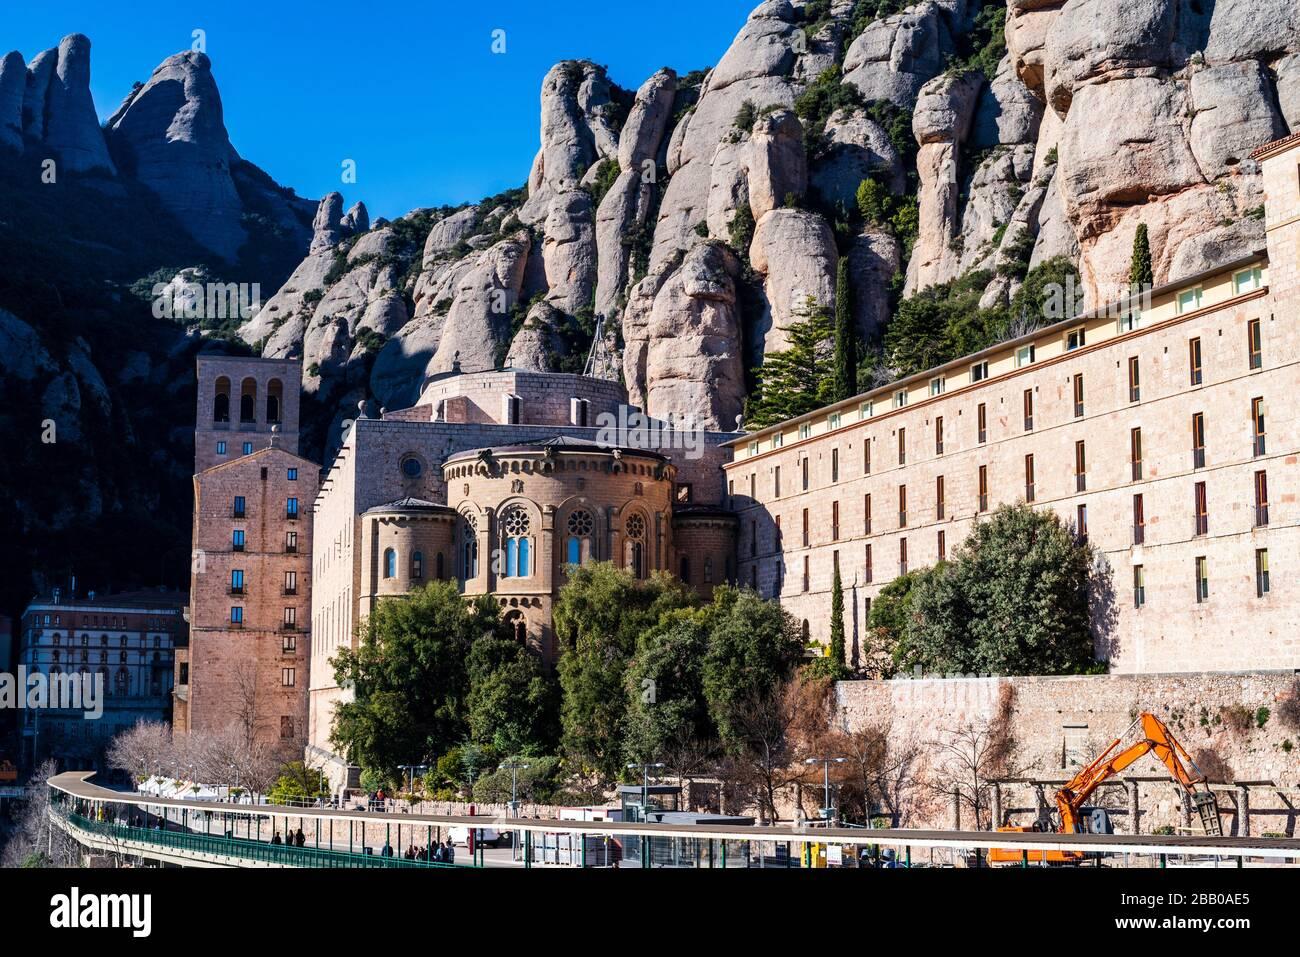 Mountain and basilica of Montserrat, Barcelona, Catalonia, Spain. Stock Photo